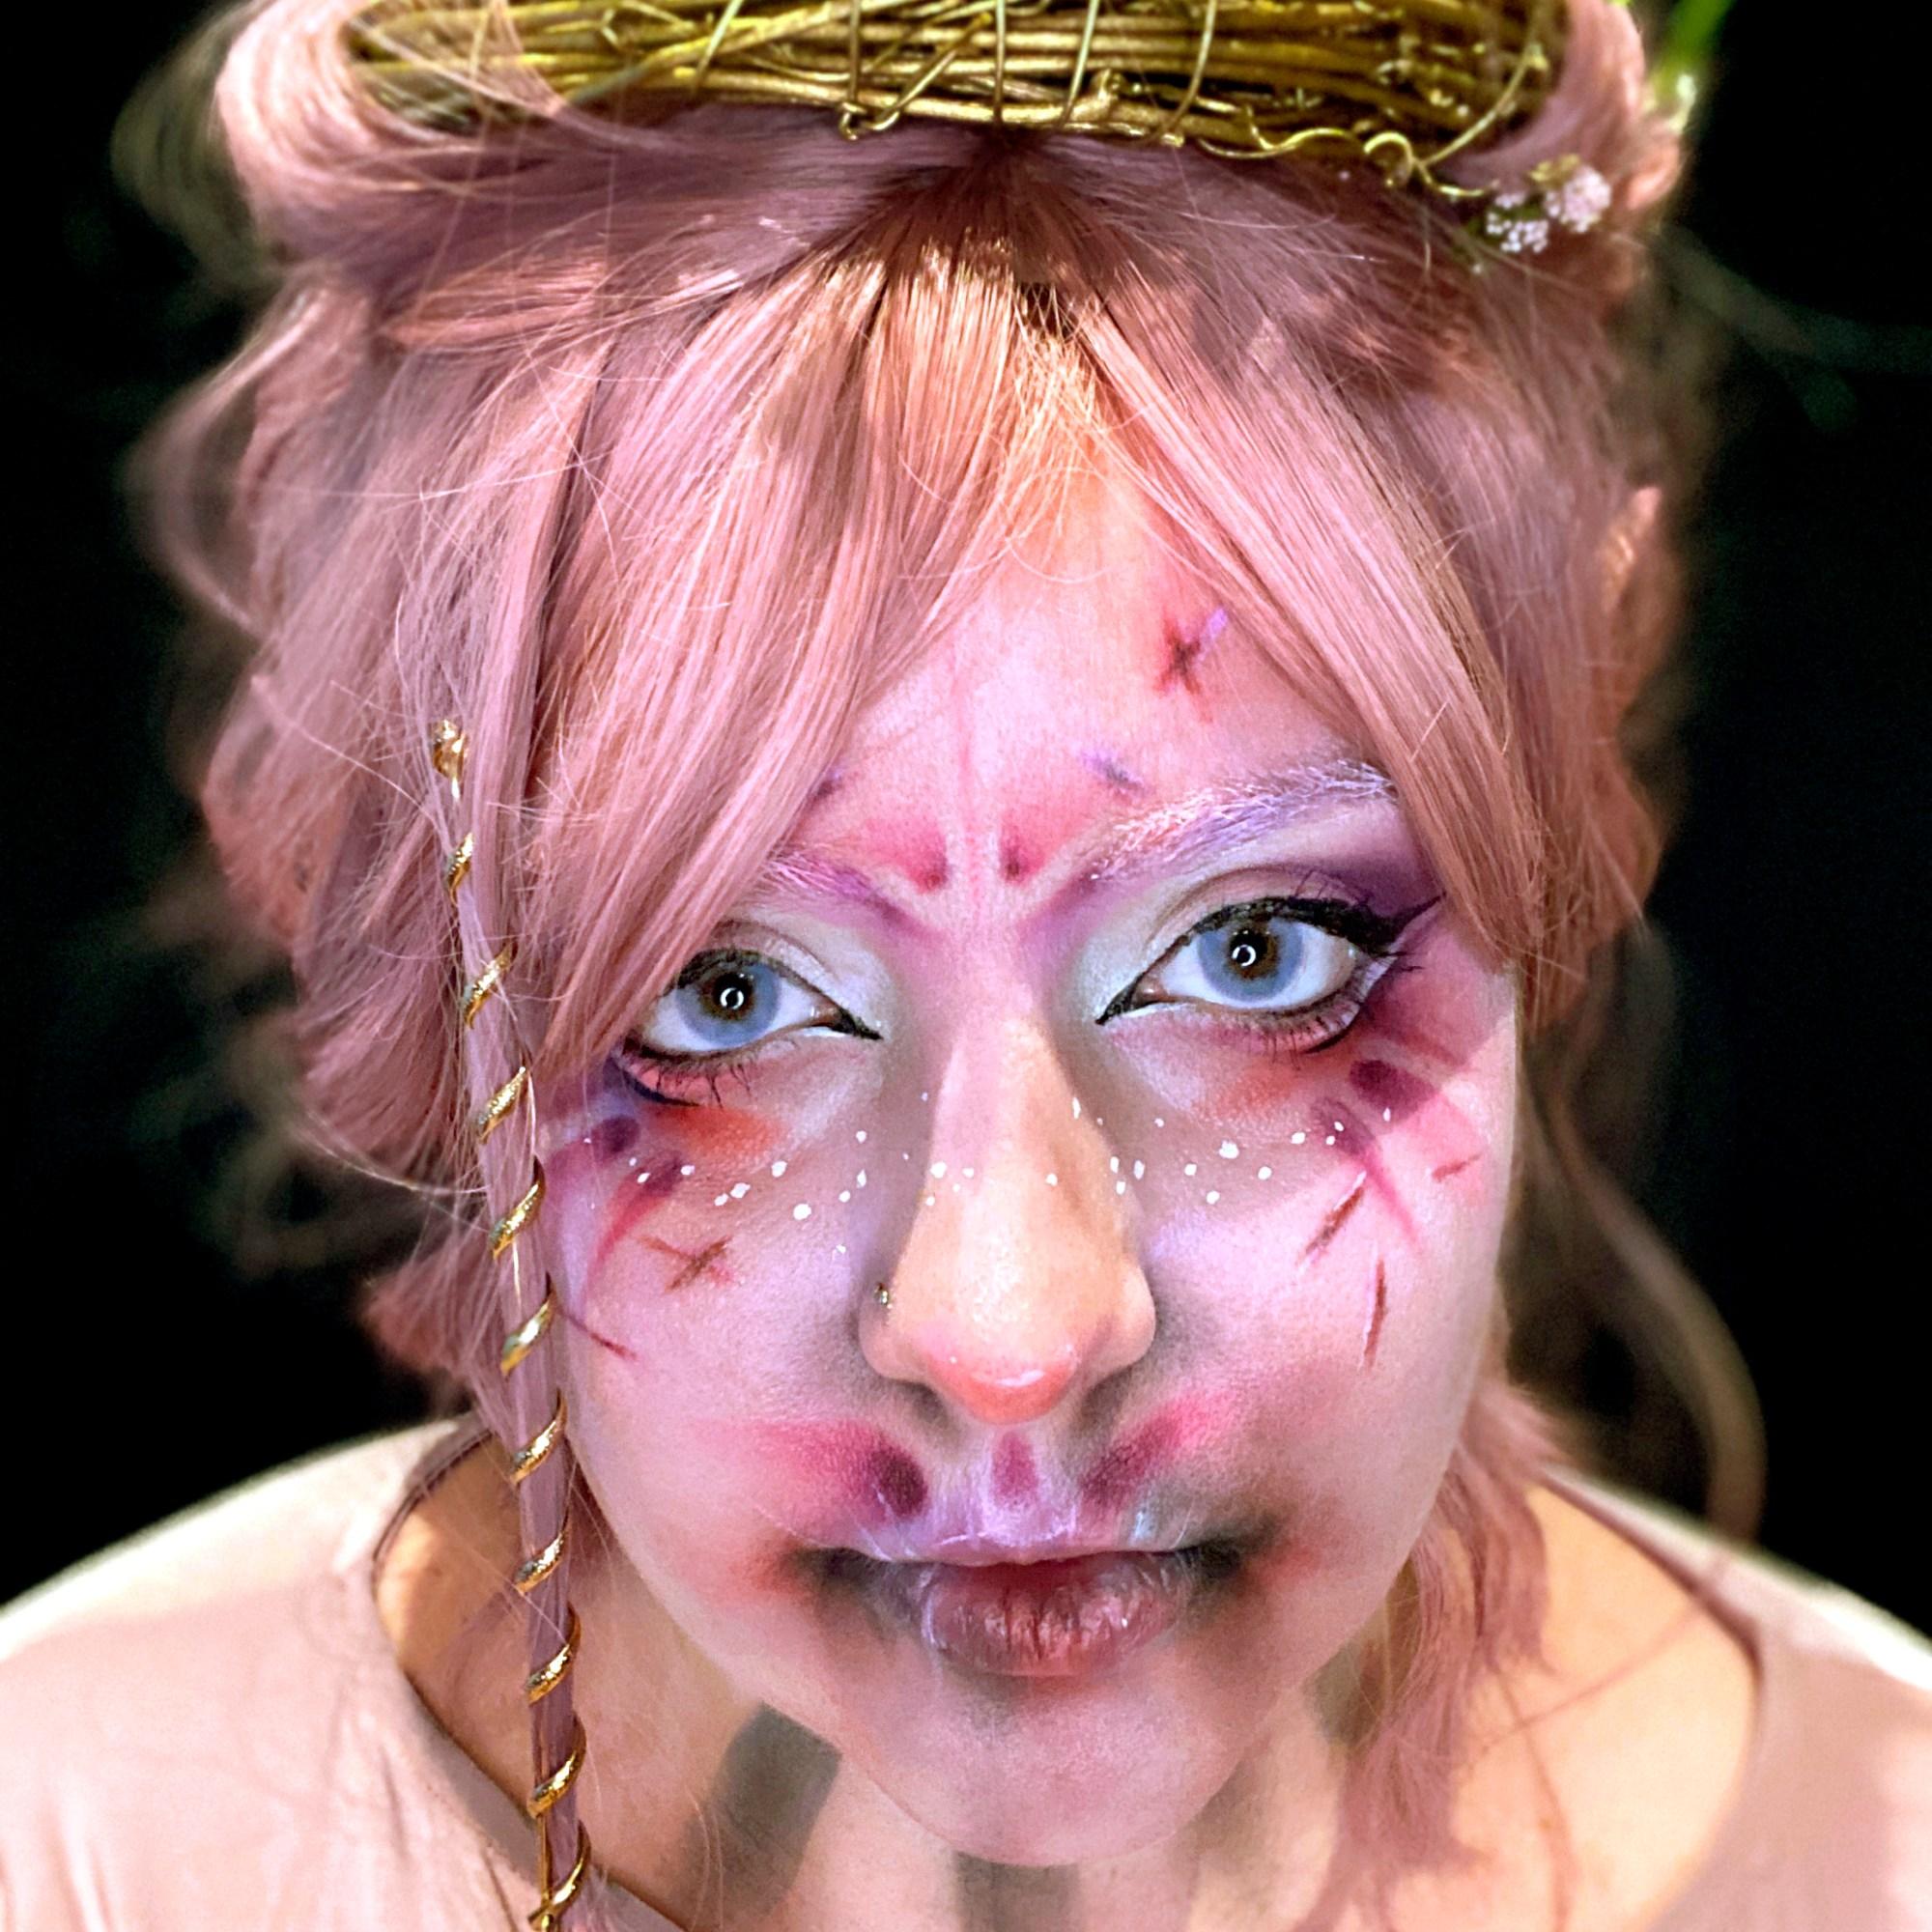 Kaitlyn Armitano as the Sugarplum Scary